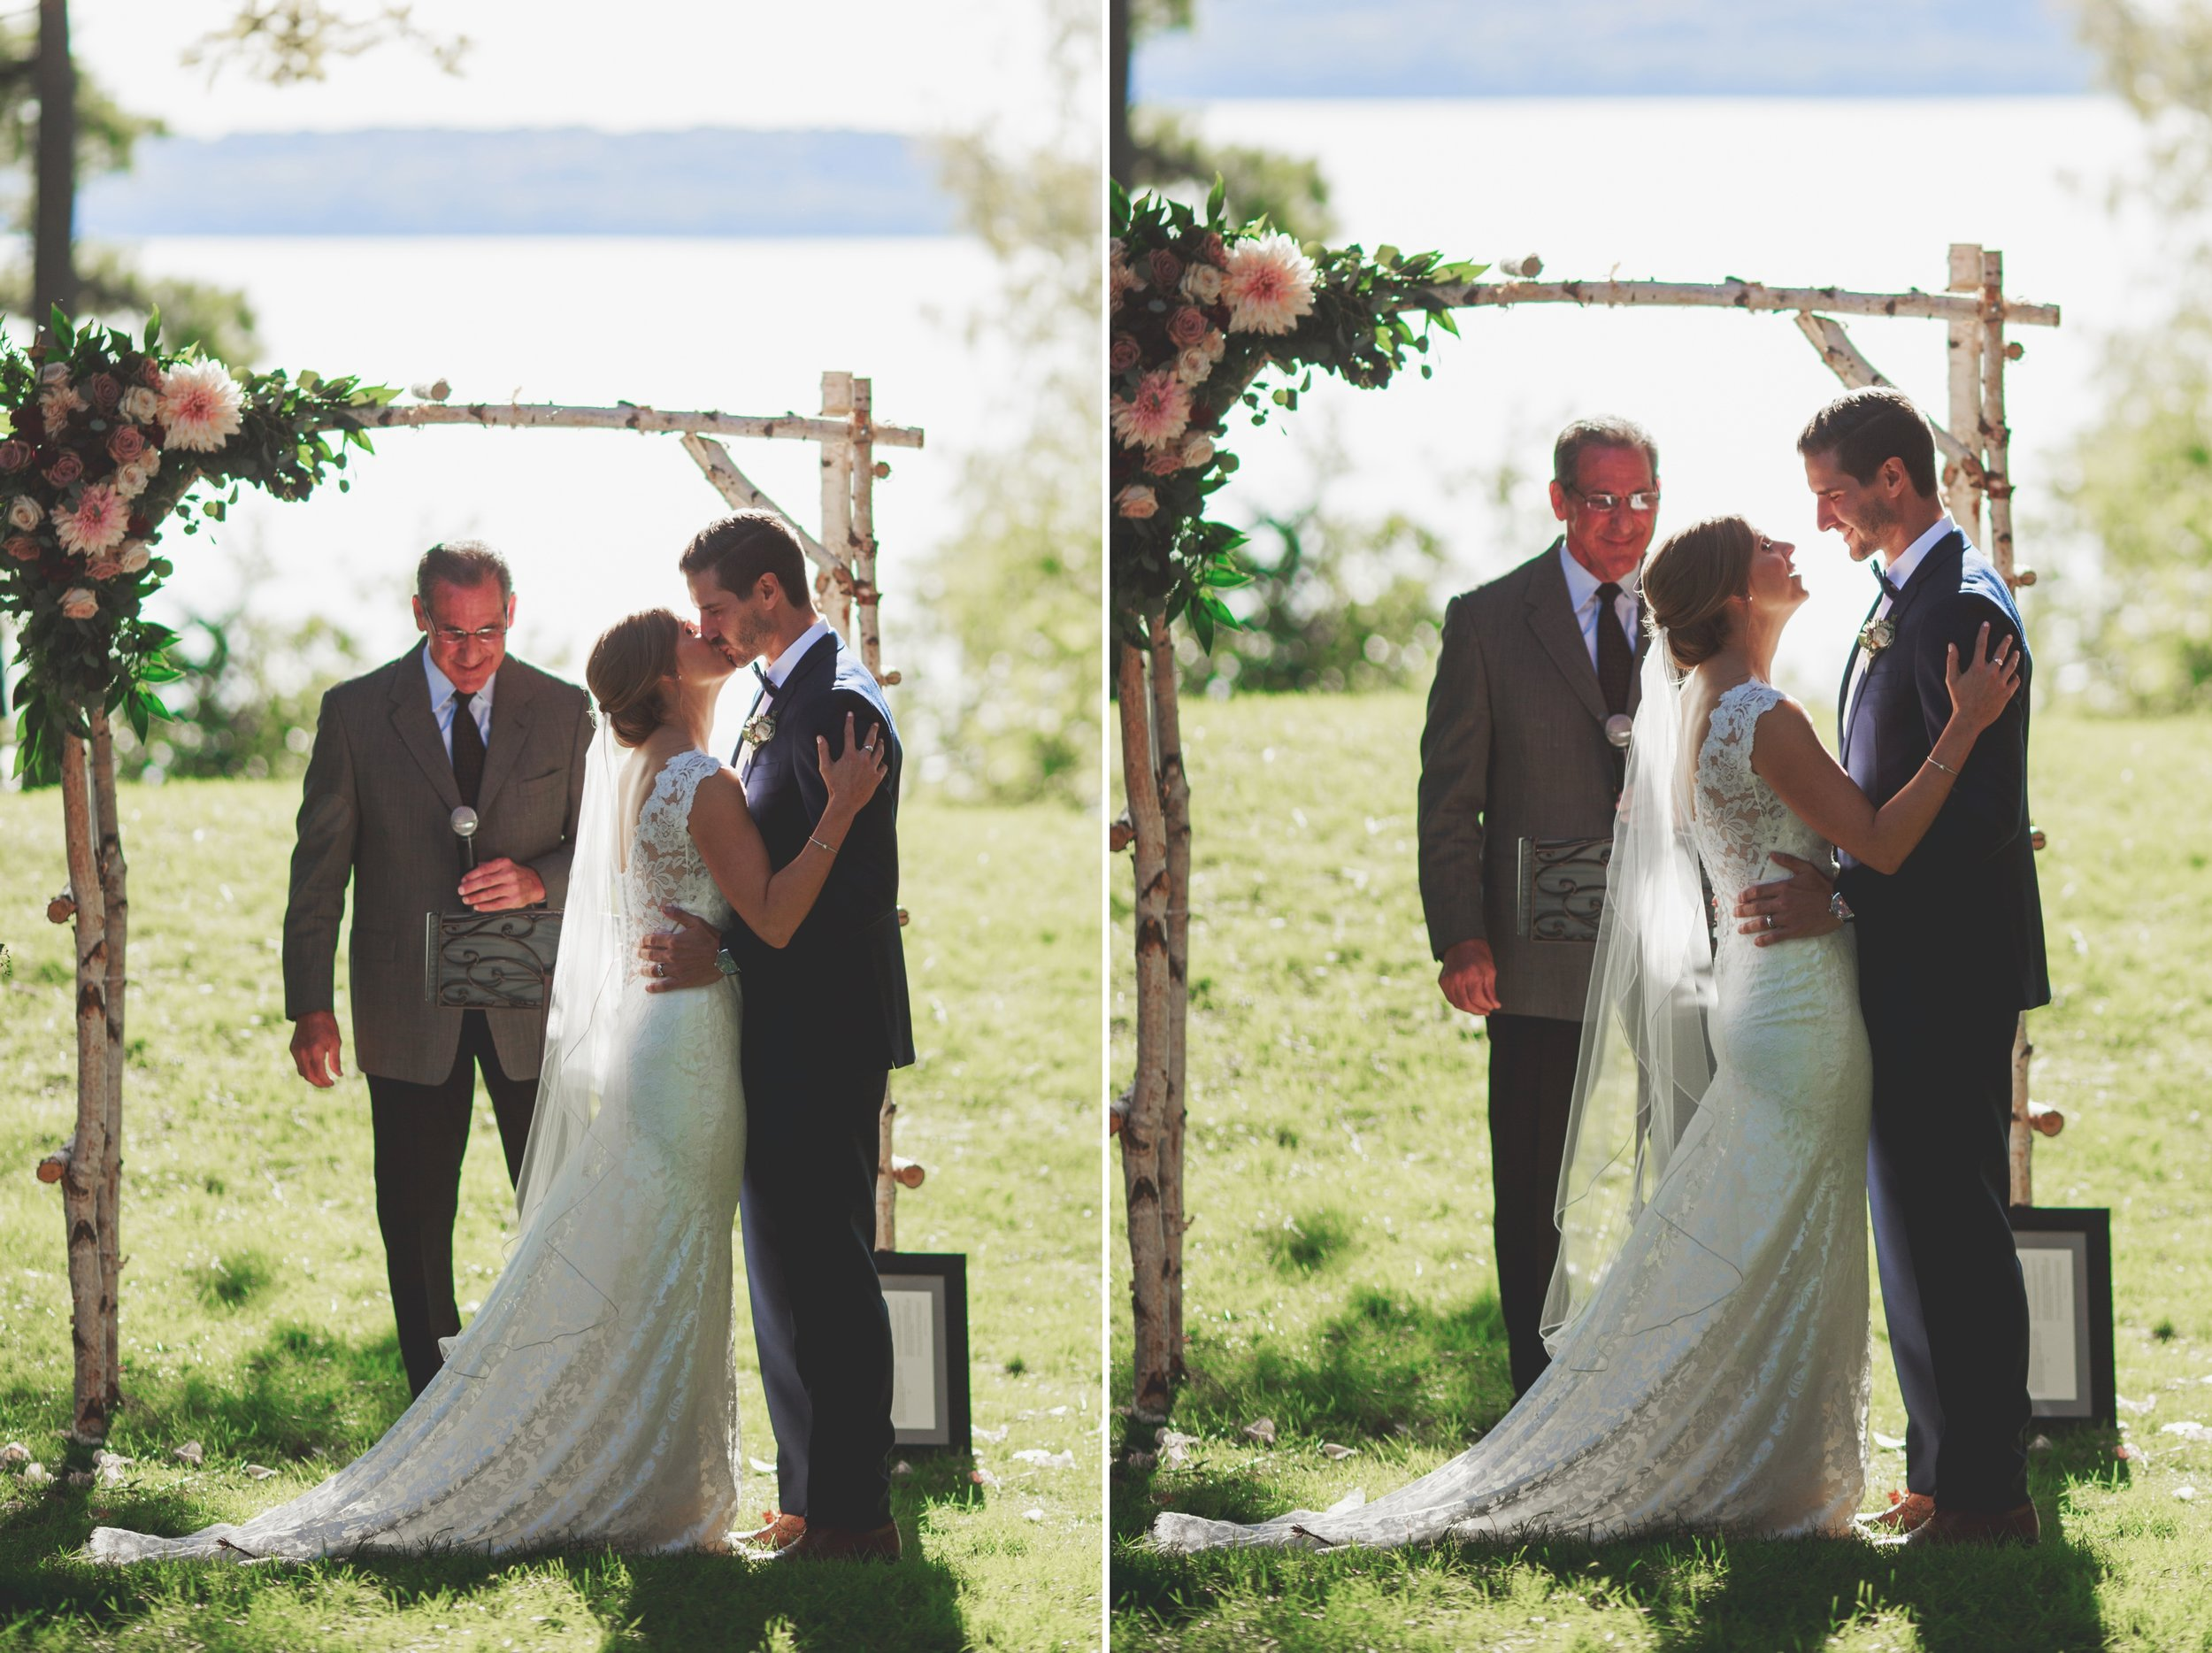 traverse_city_wedding_065.jpg